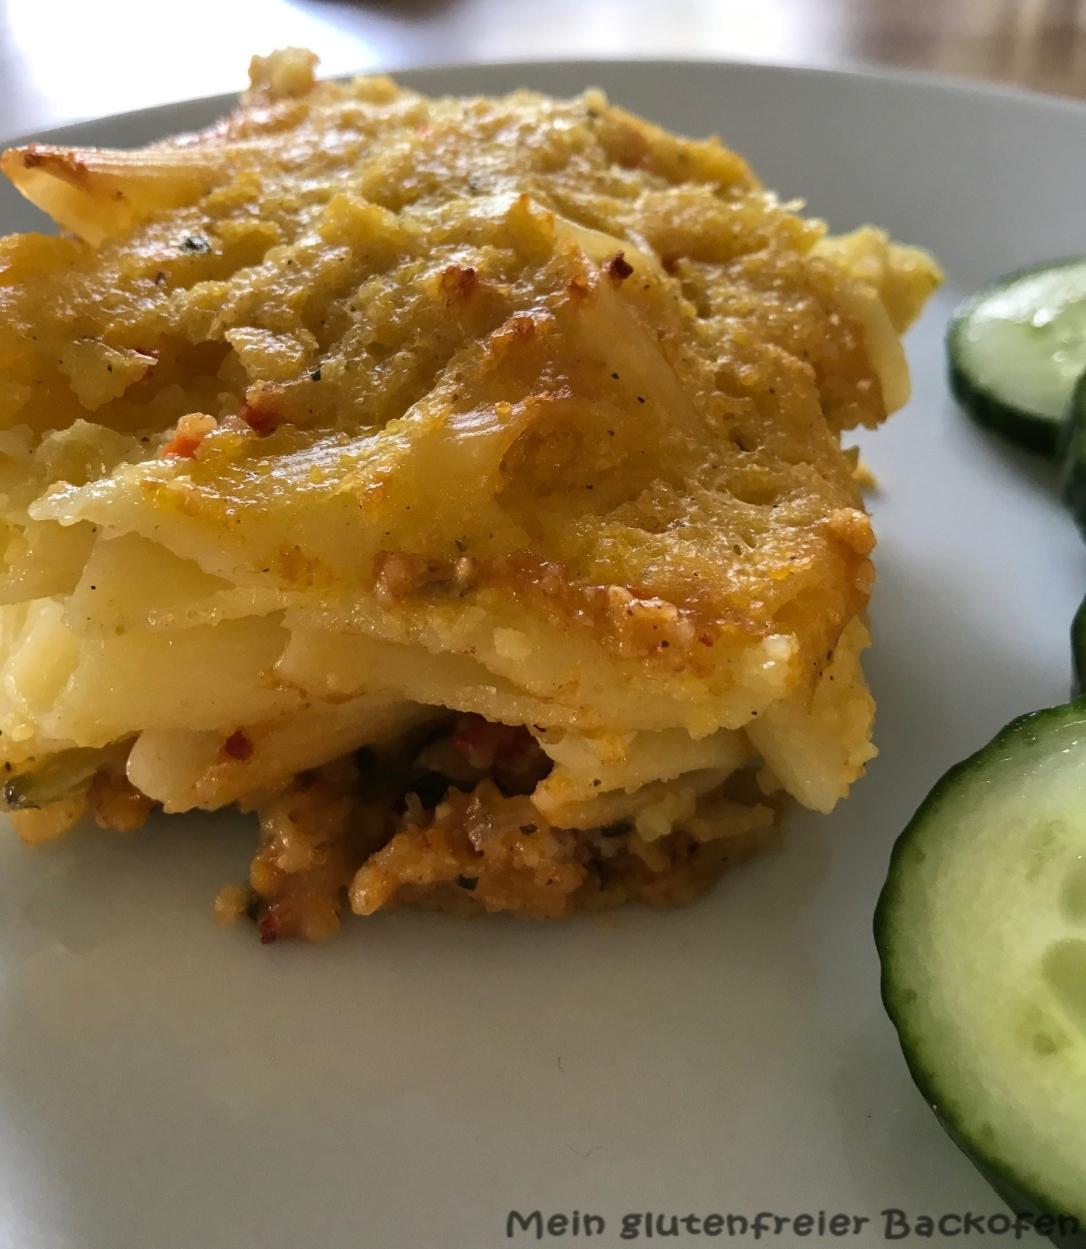 Leckeres fast veganes Rezept für Pastizio